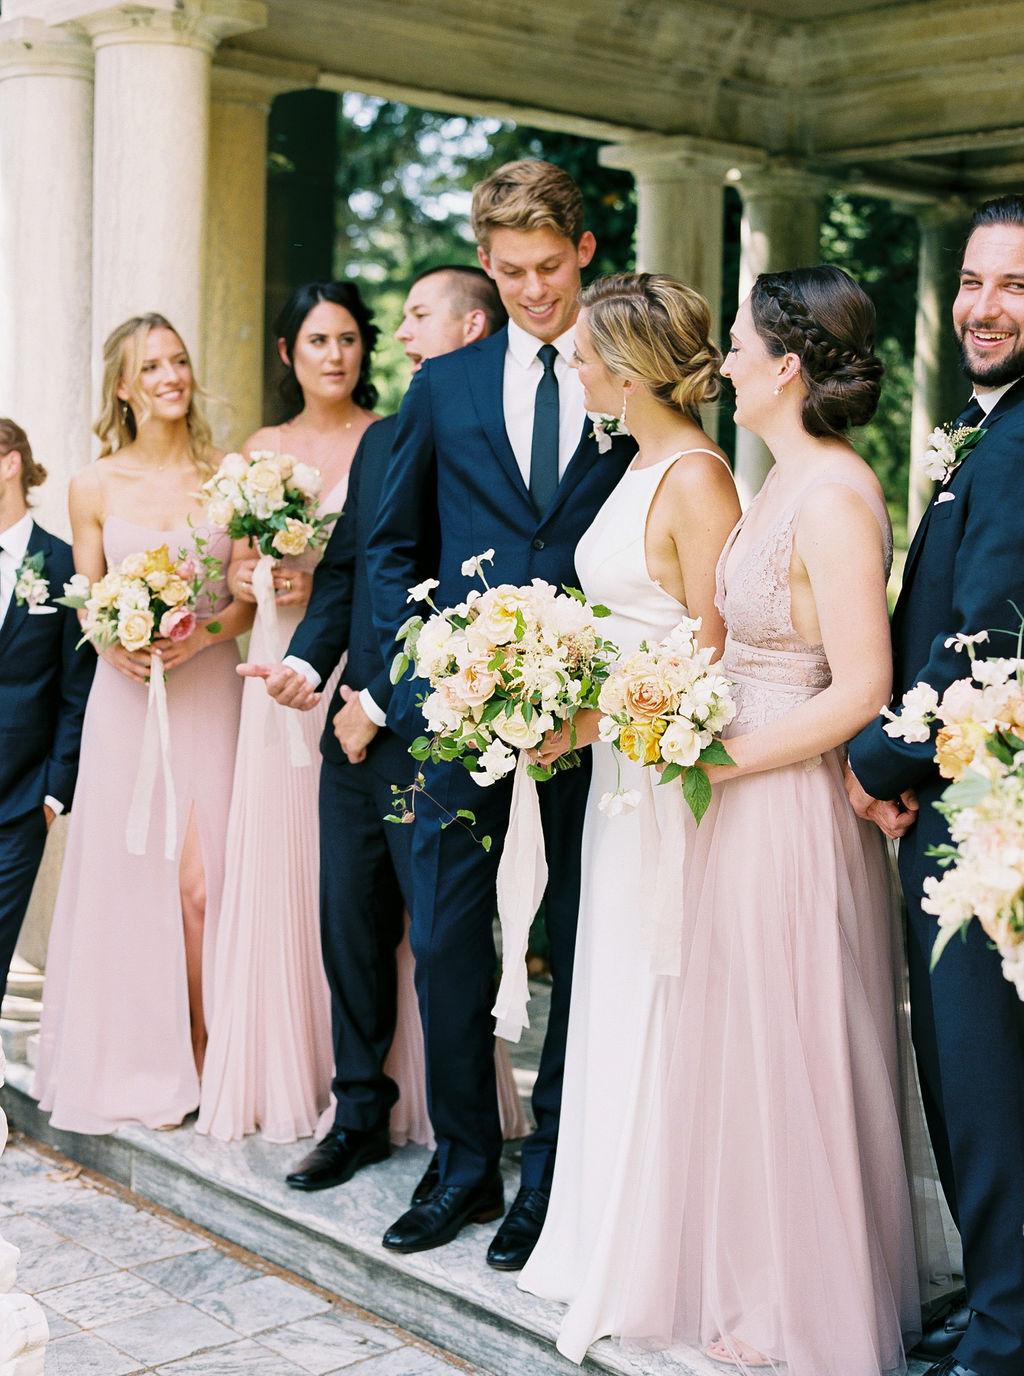 Alexandra-Elise-Photography-Film-Wedding-Photographer-Sonnenberg-Gardens-Finger-Lakes-Canandaigua-Wedding-Party-021.jpg